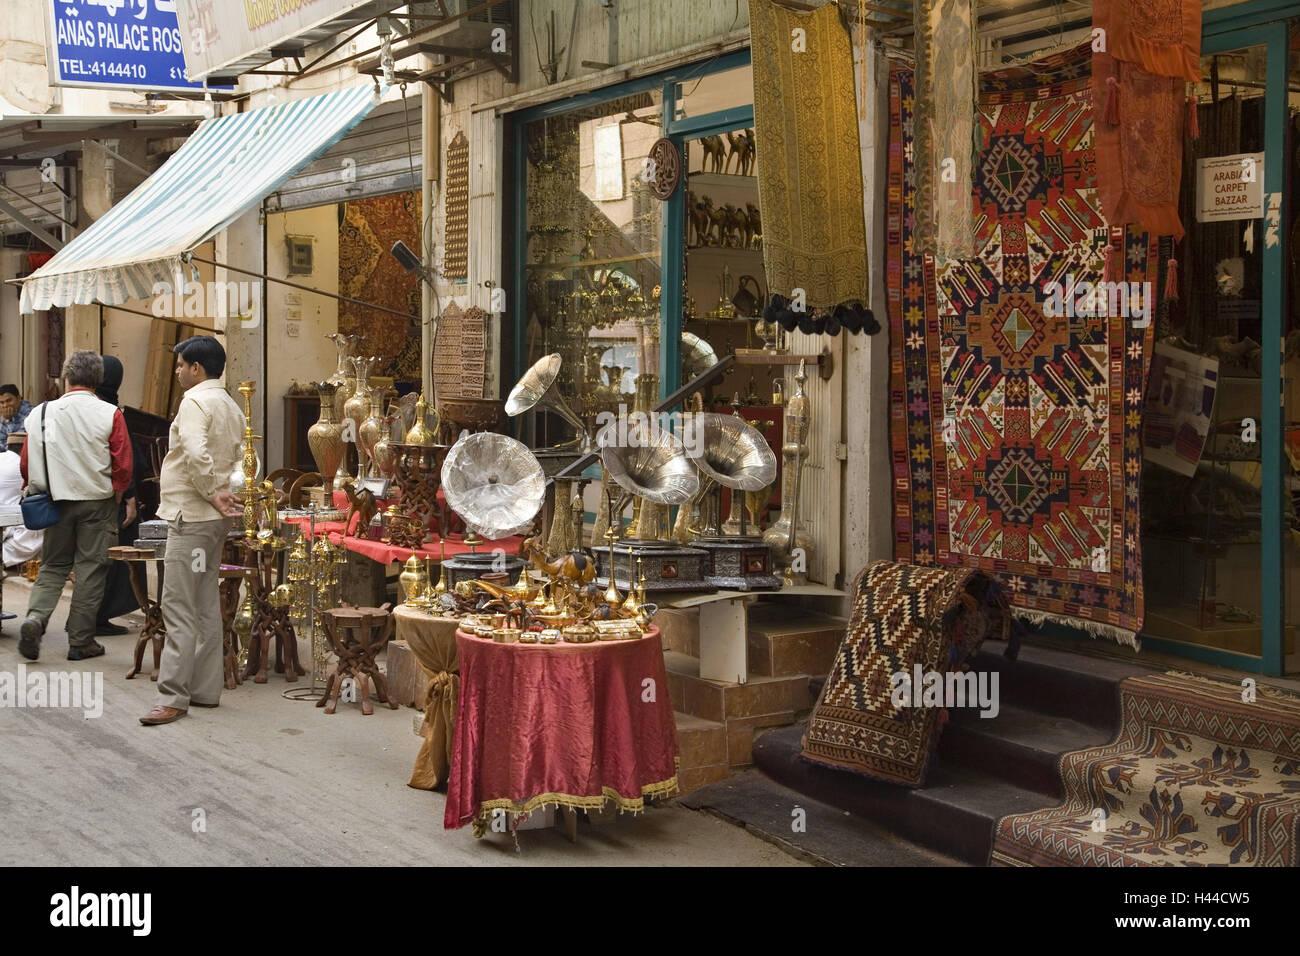 L'Arabie saoudite, Riyad, Arabie saoudite, boutiques, les touristes, Photo Stock